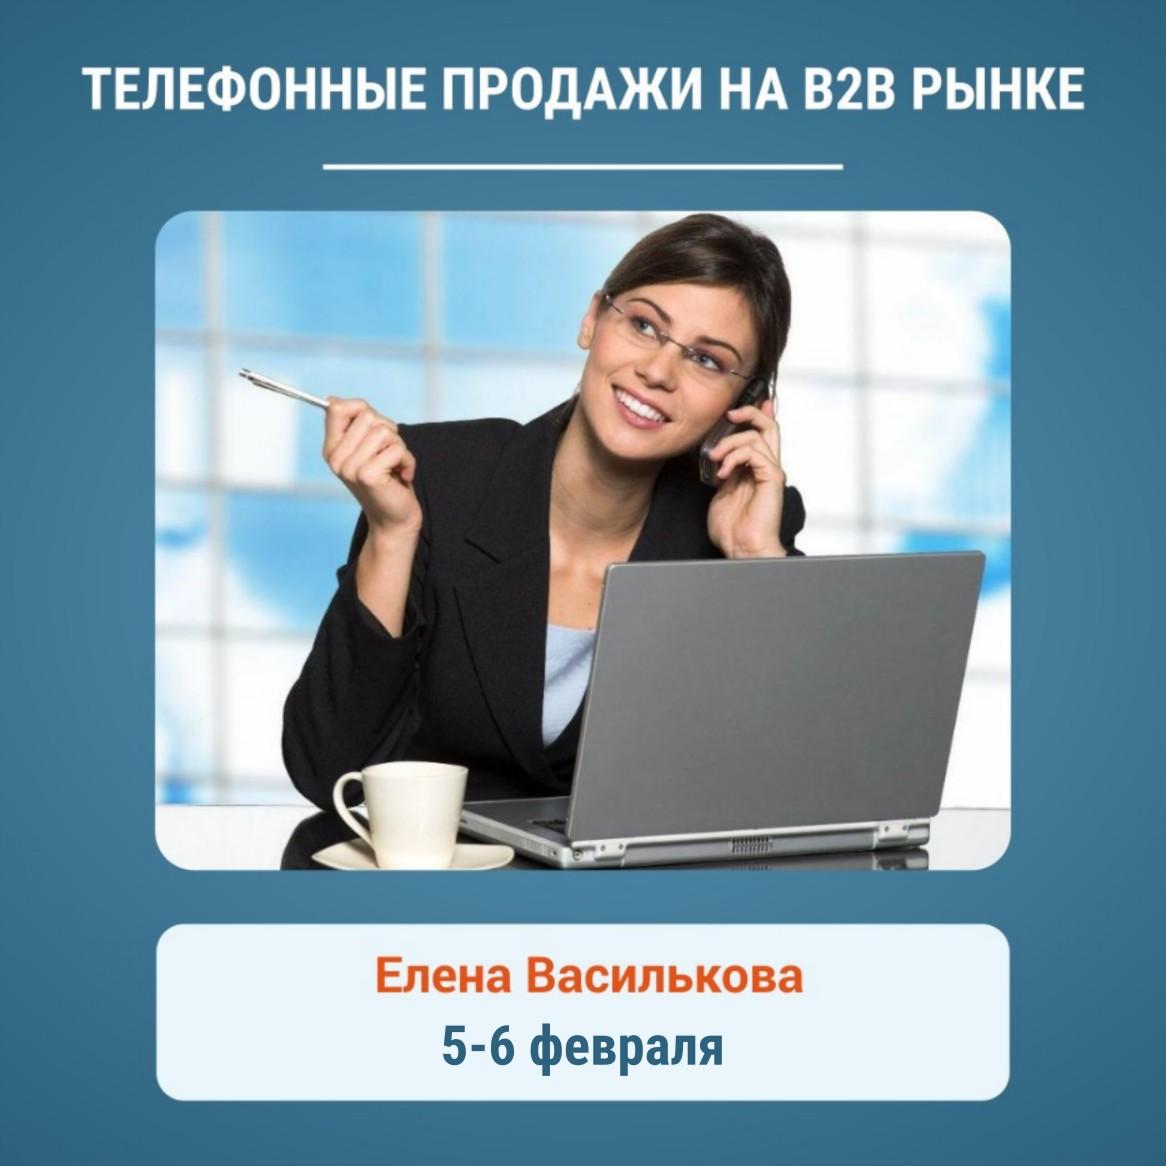 Телефонные продажи на b2b рынке